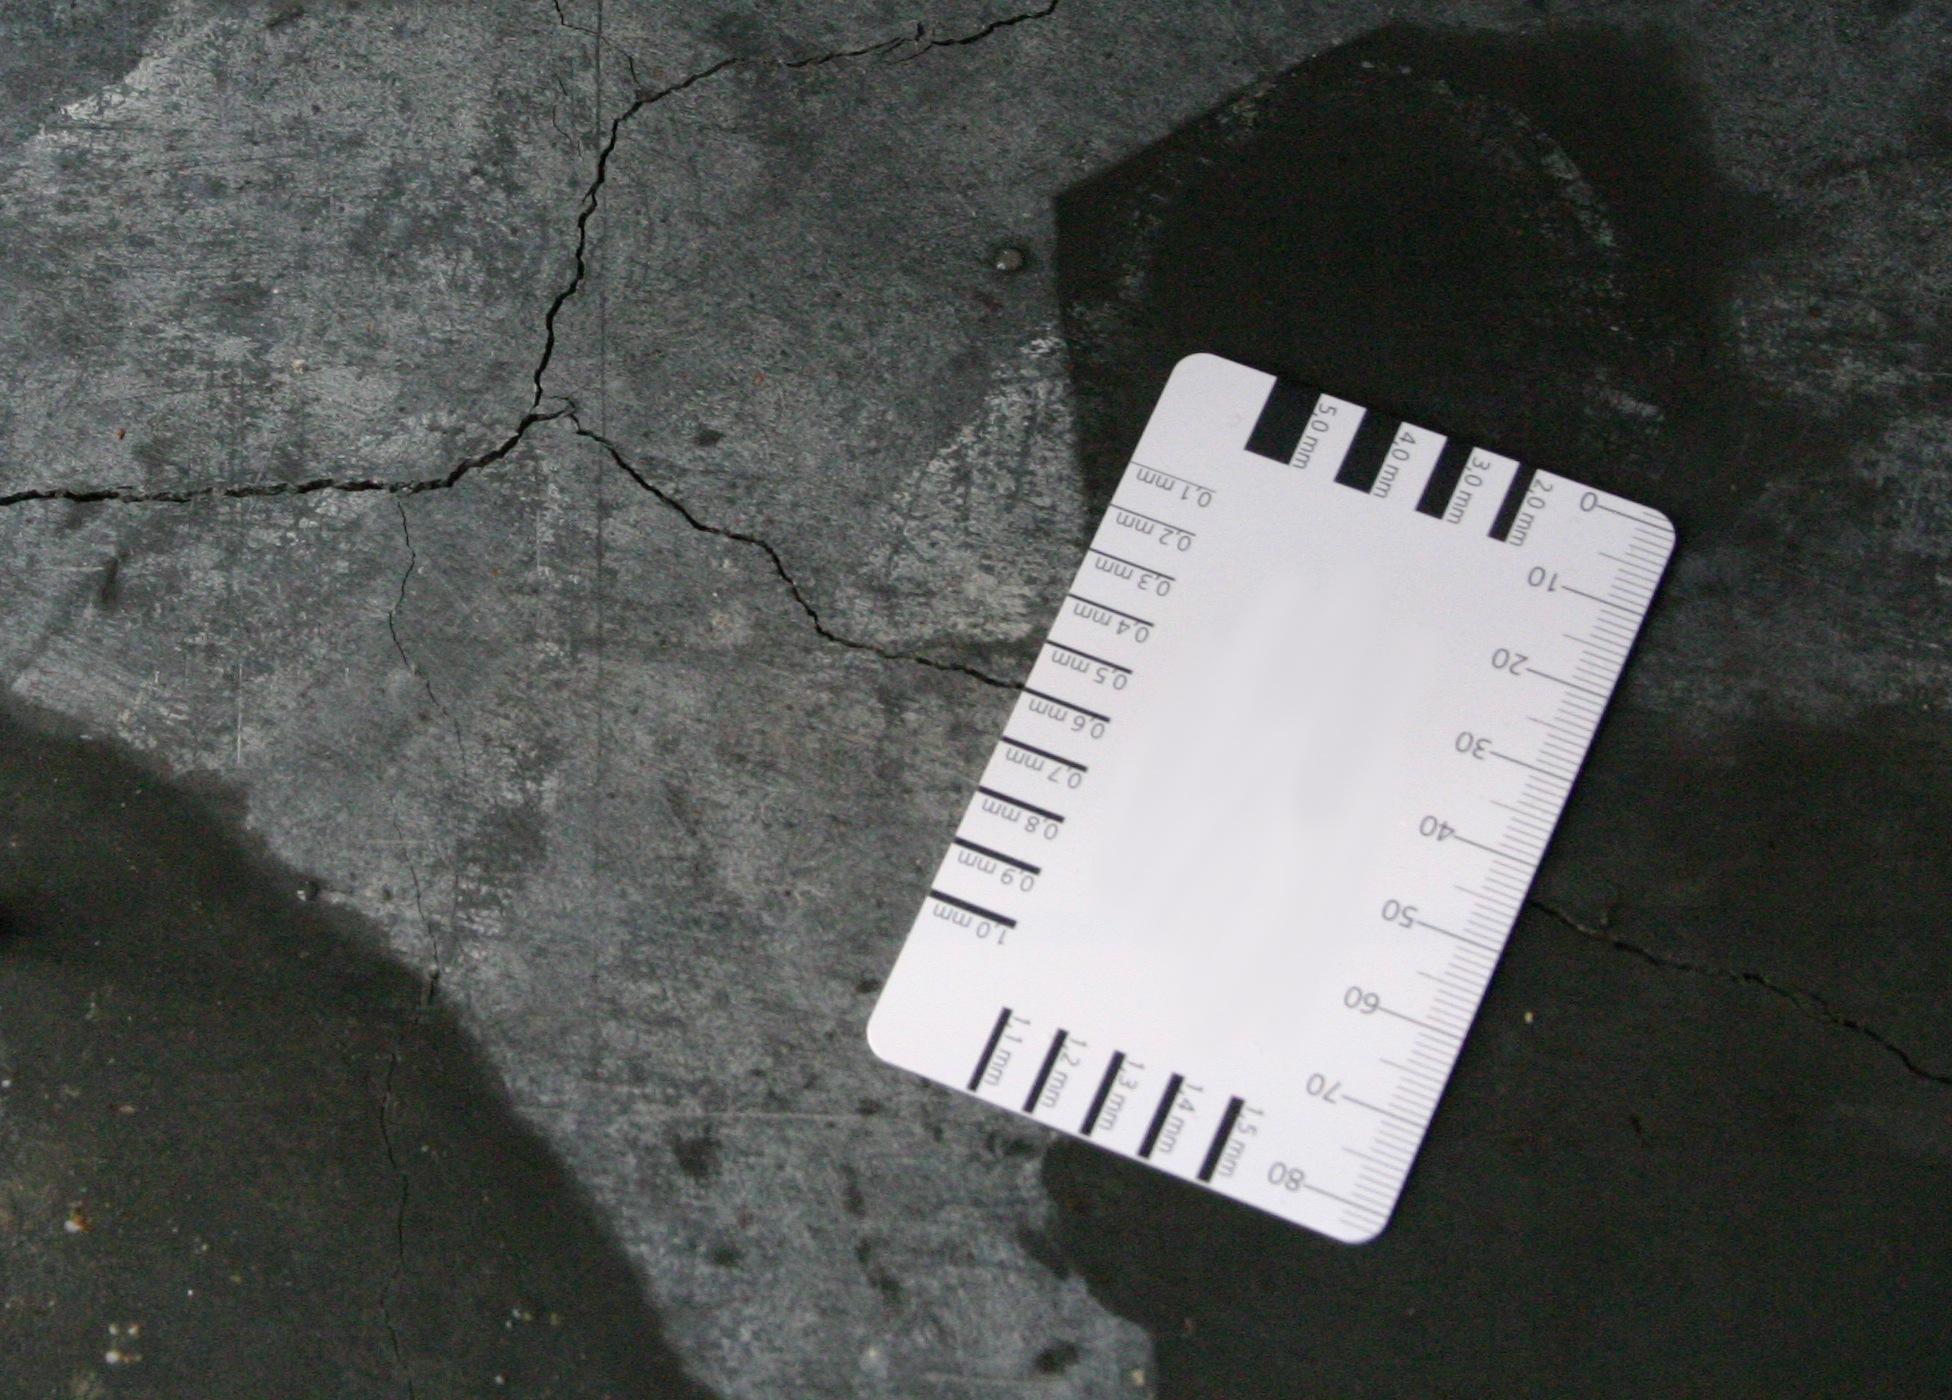 Scheurwijdtemeter